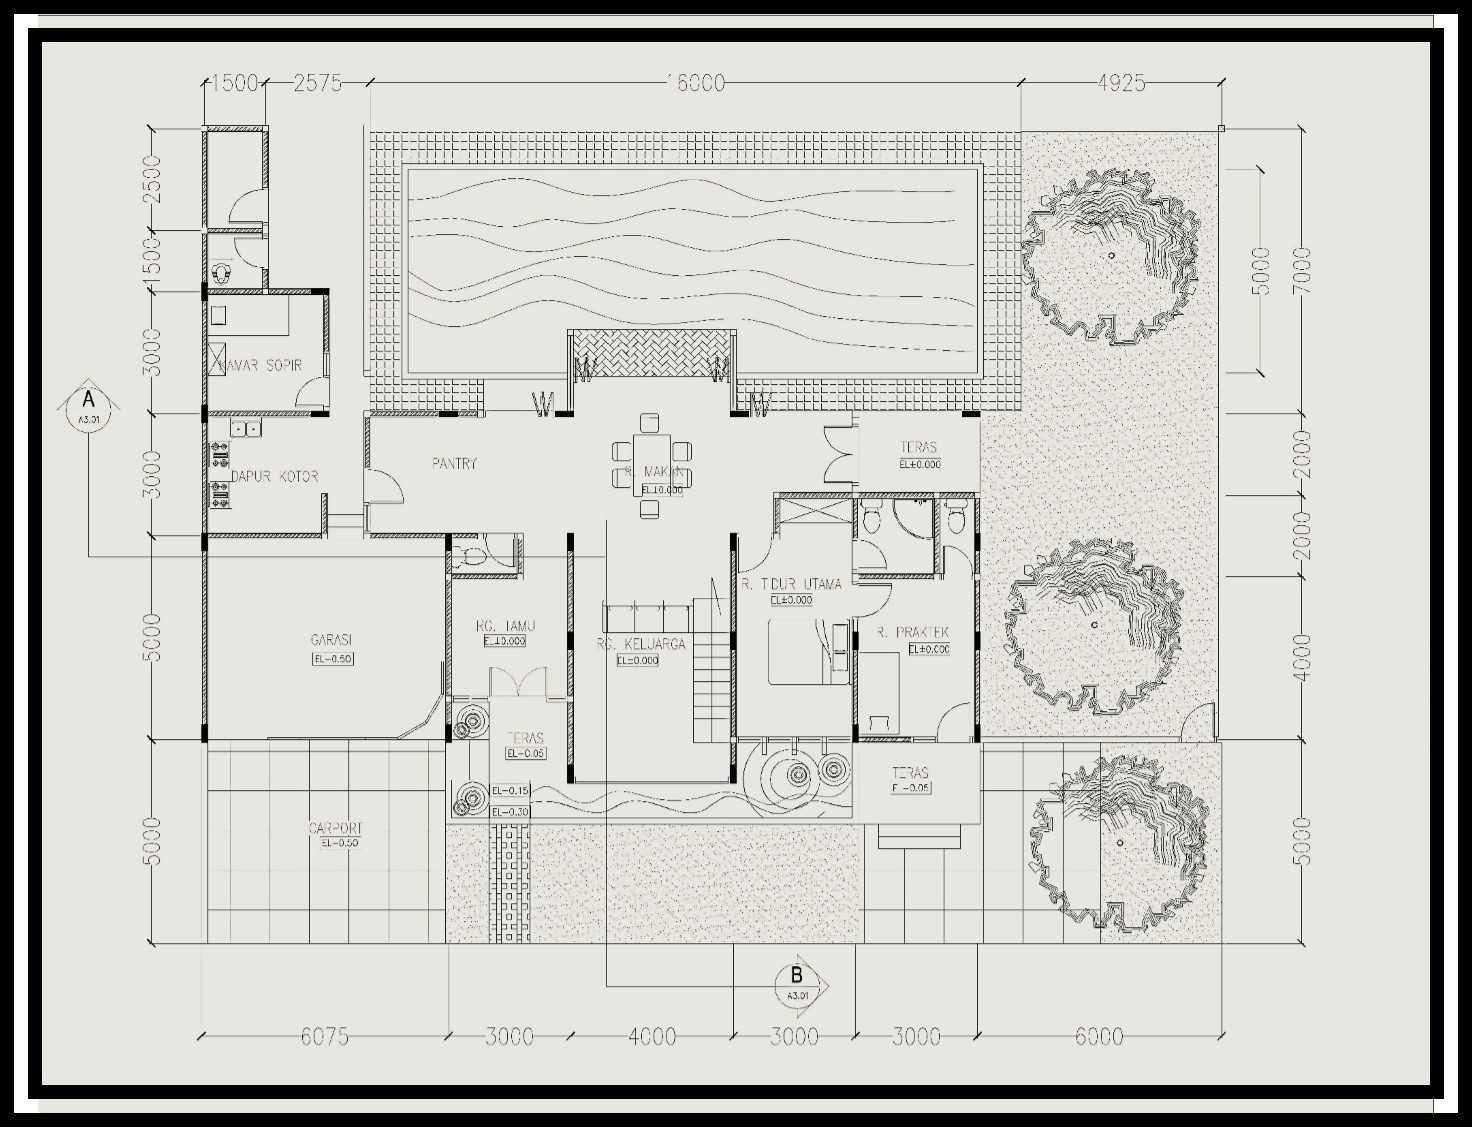 Ideall Design Rumah Klinik Dokter Kontemporer Padang, Kota Padang, Sumatera Barat, Indonesia Padang, Kota Padang, Sumatera Barat, Indonesia Ideall-Design-When-A-Design-Idea-Becomes-Ideal-Design-For-All-Rumah-Klinik-Kontemporer   114203